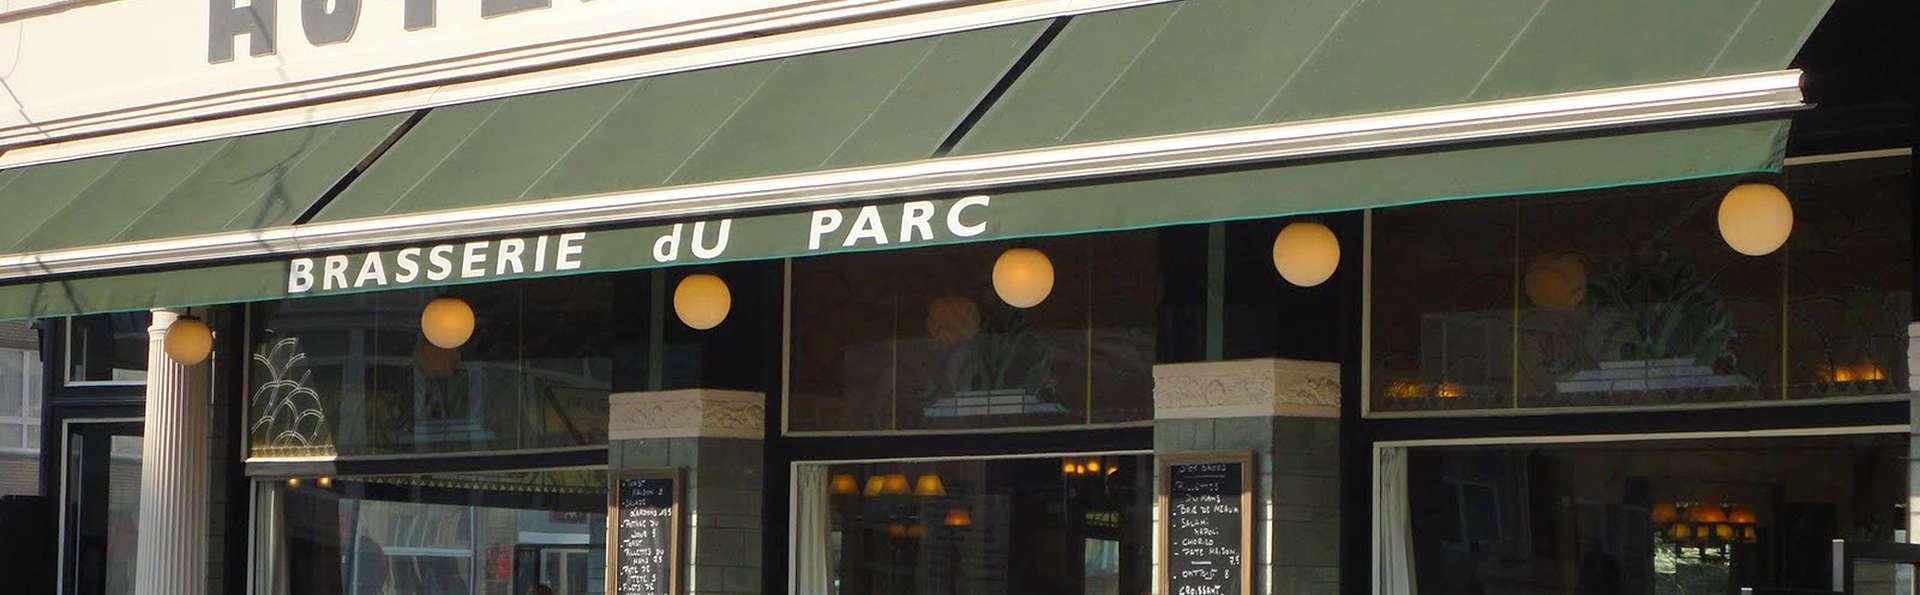 Hotel du Parc - EDIT_Exterior1.jpg